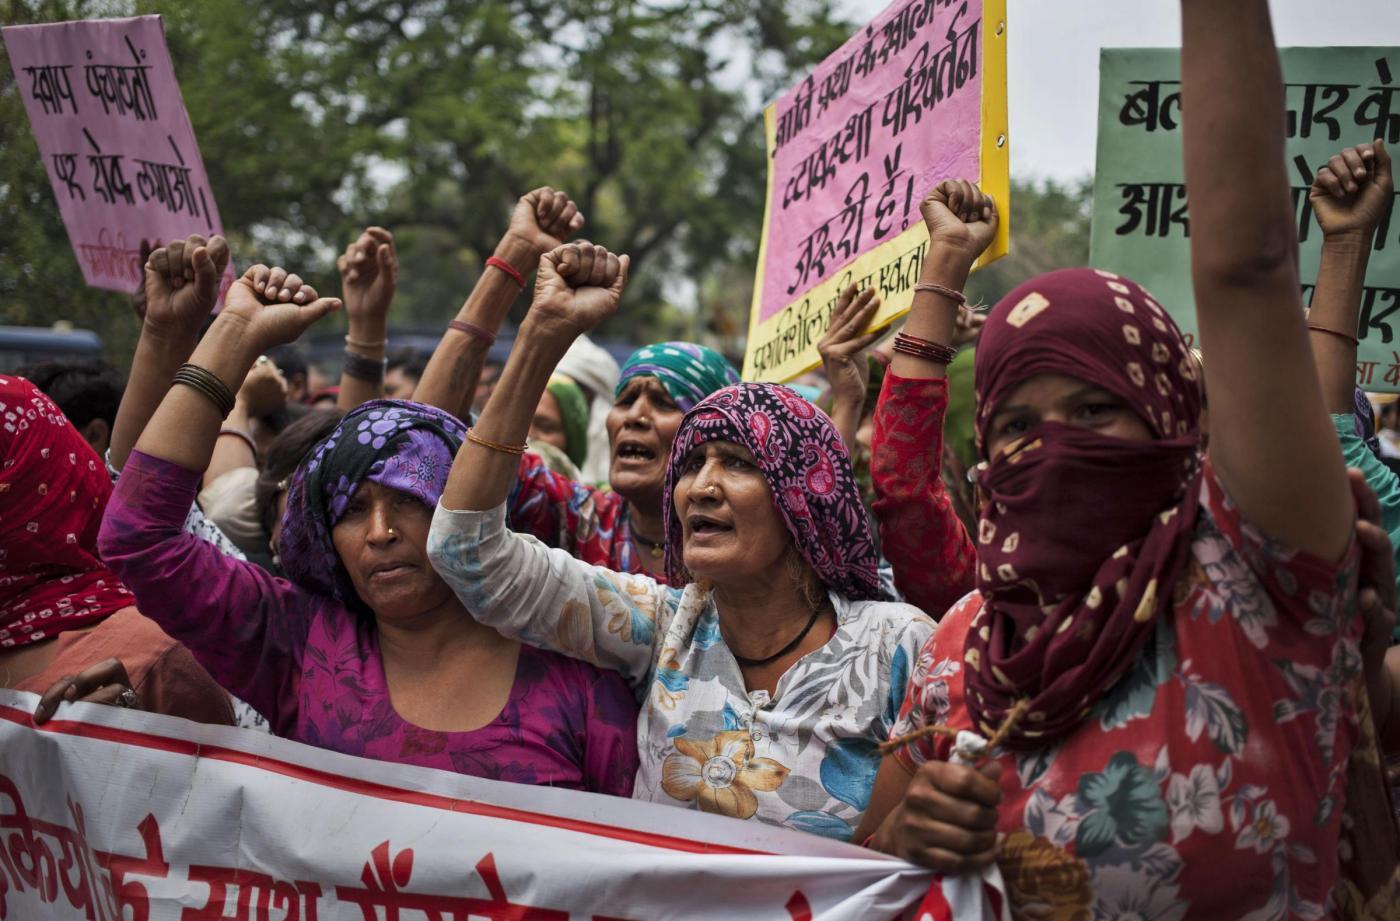 Stupro per punizione in India